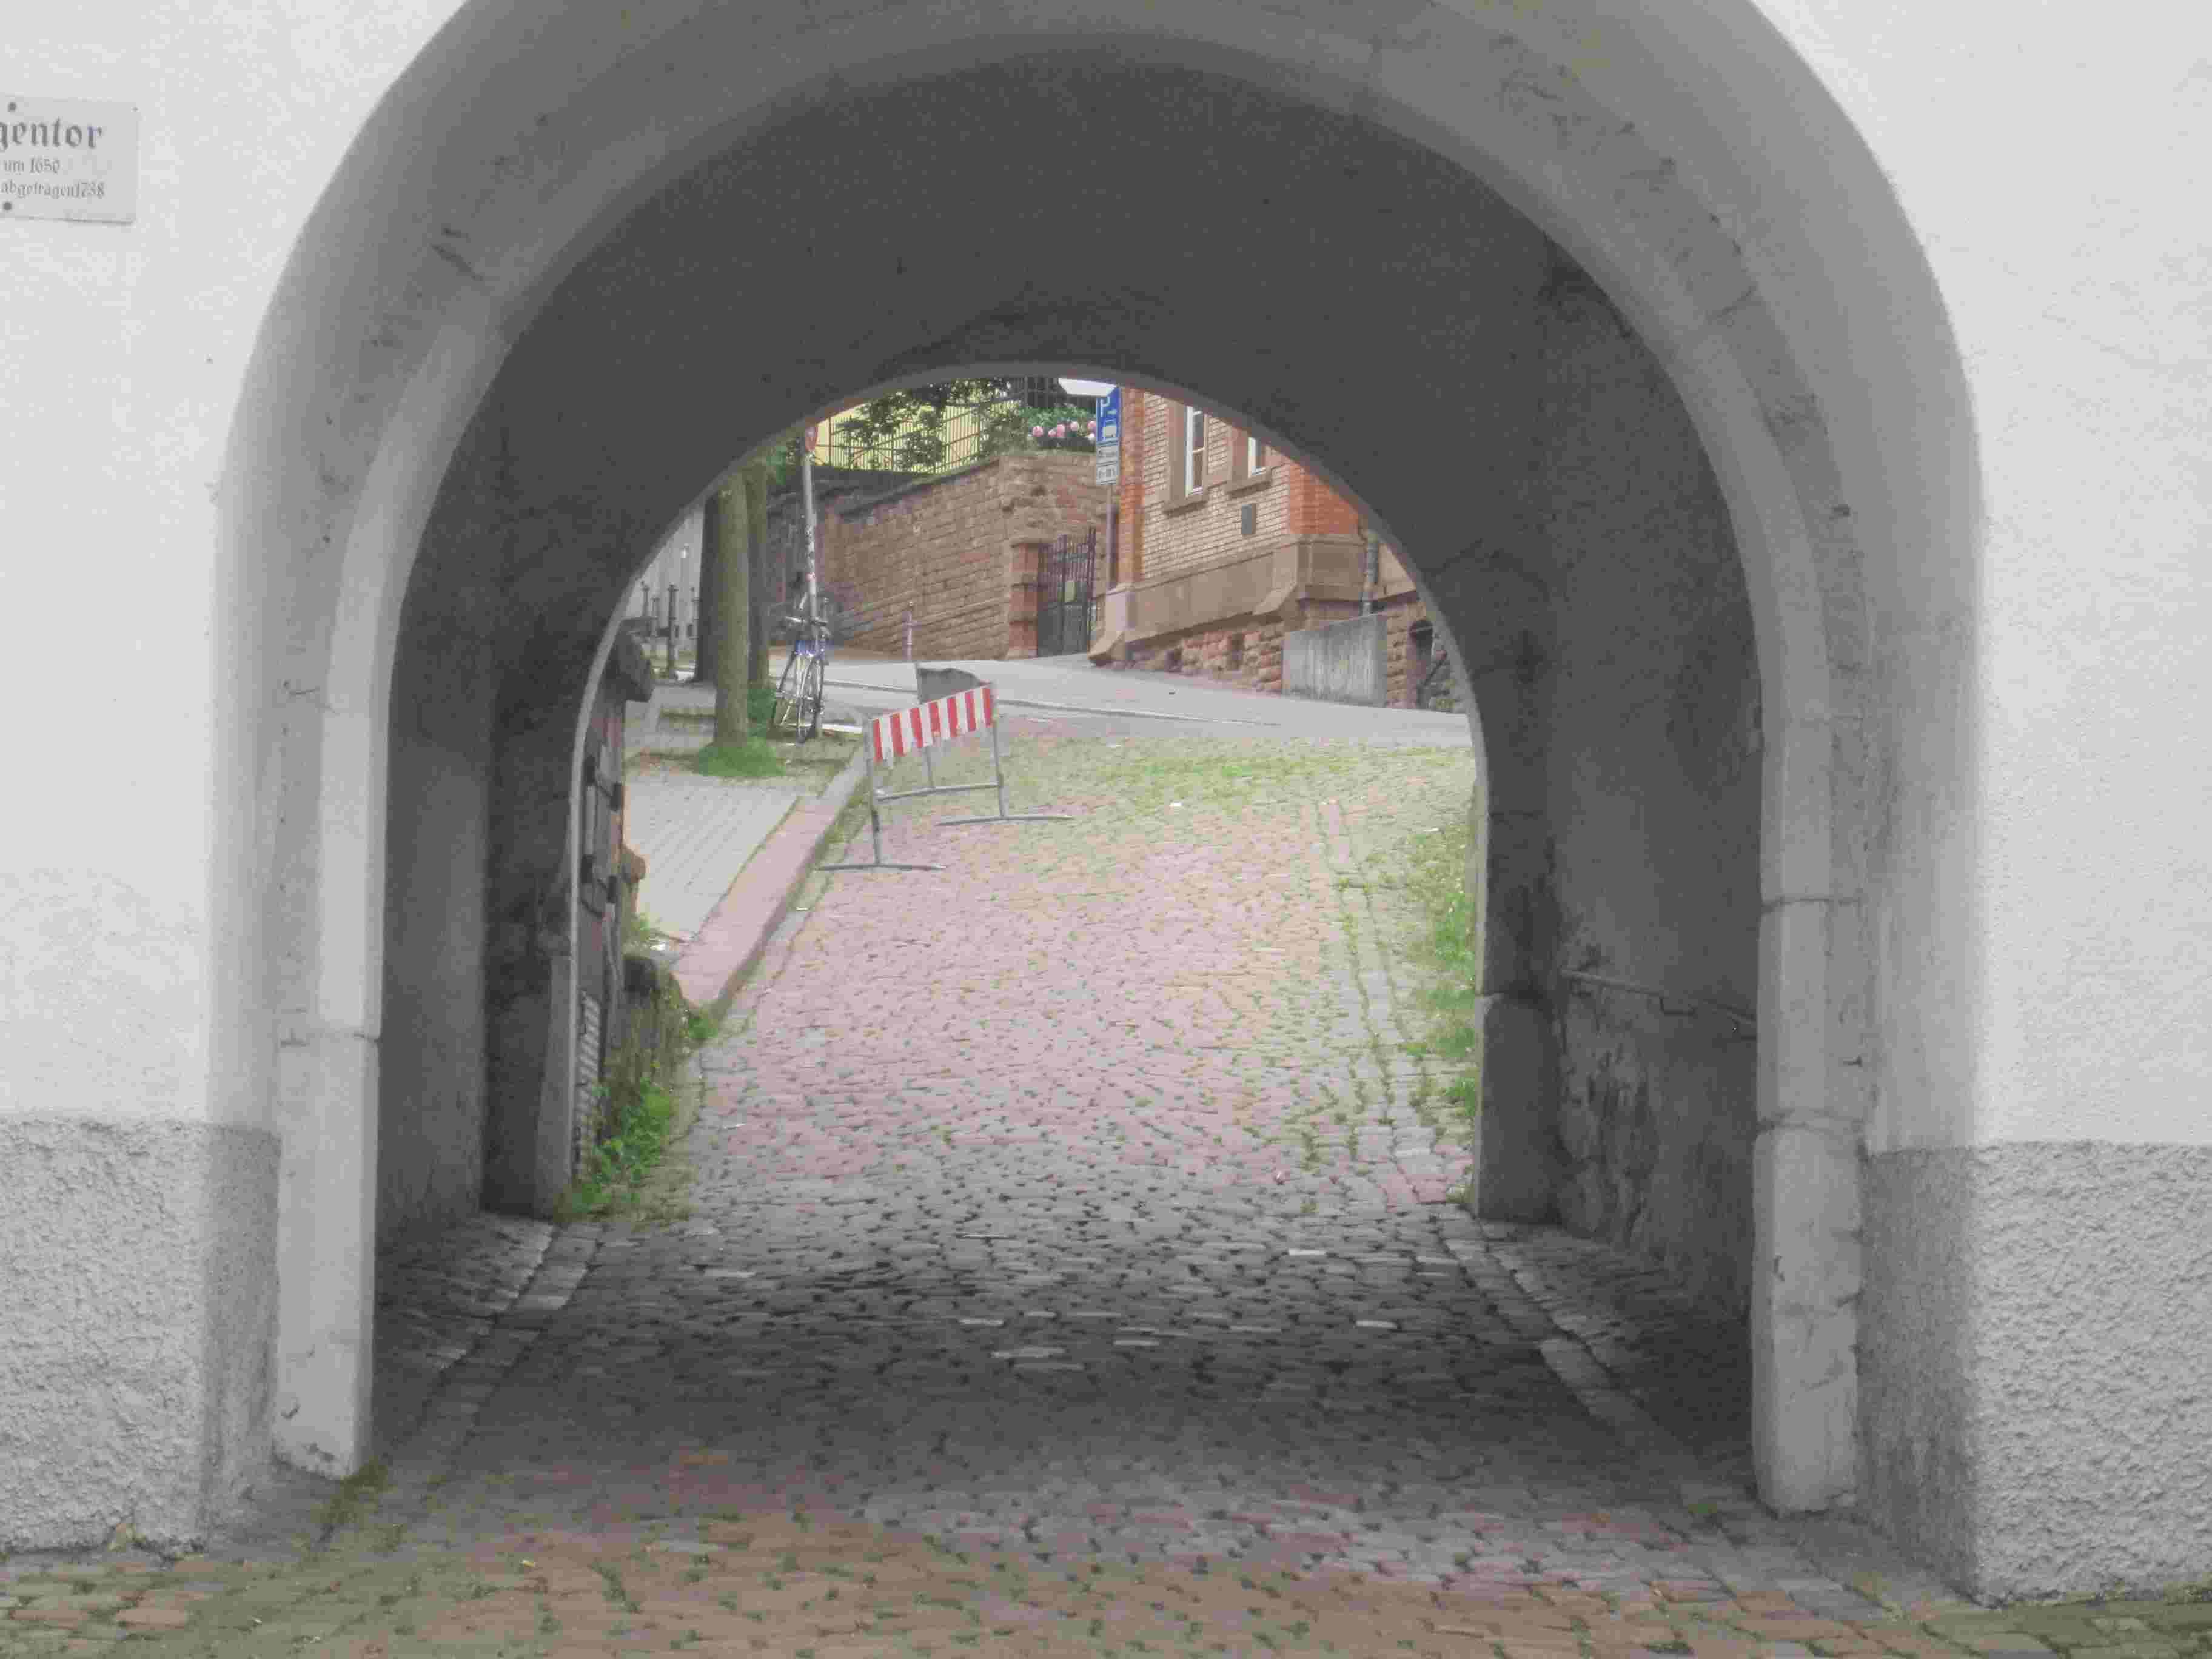 tunnel osterburken fertigstellung